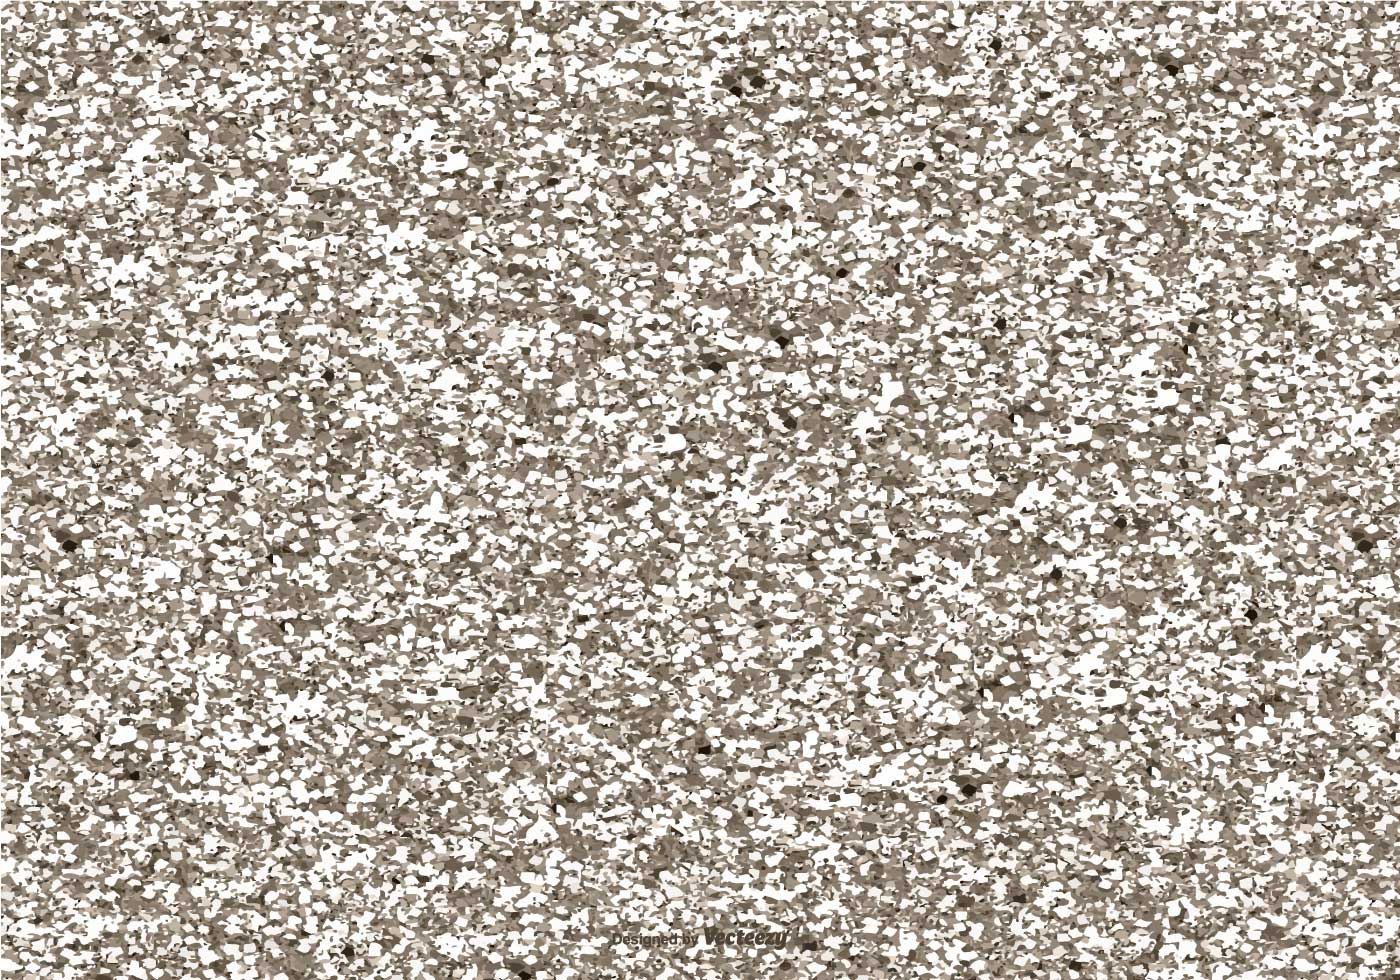 Gold Vector Glitter Background Download Free Vector Art